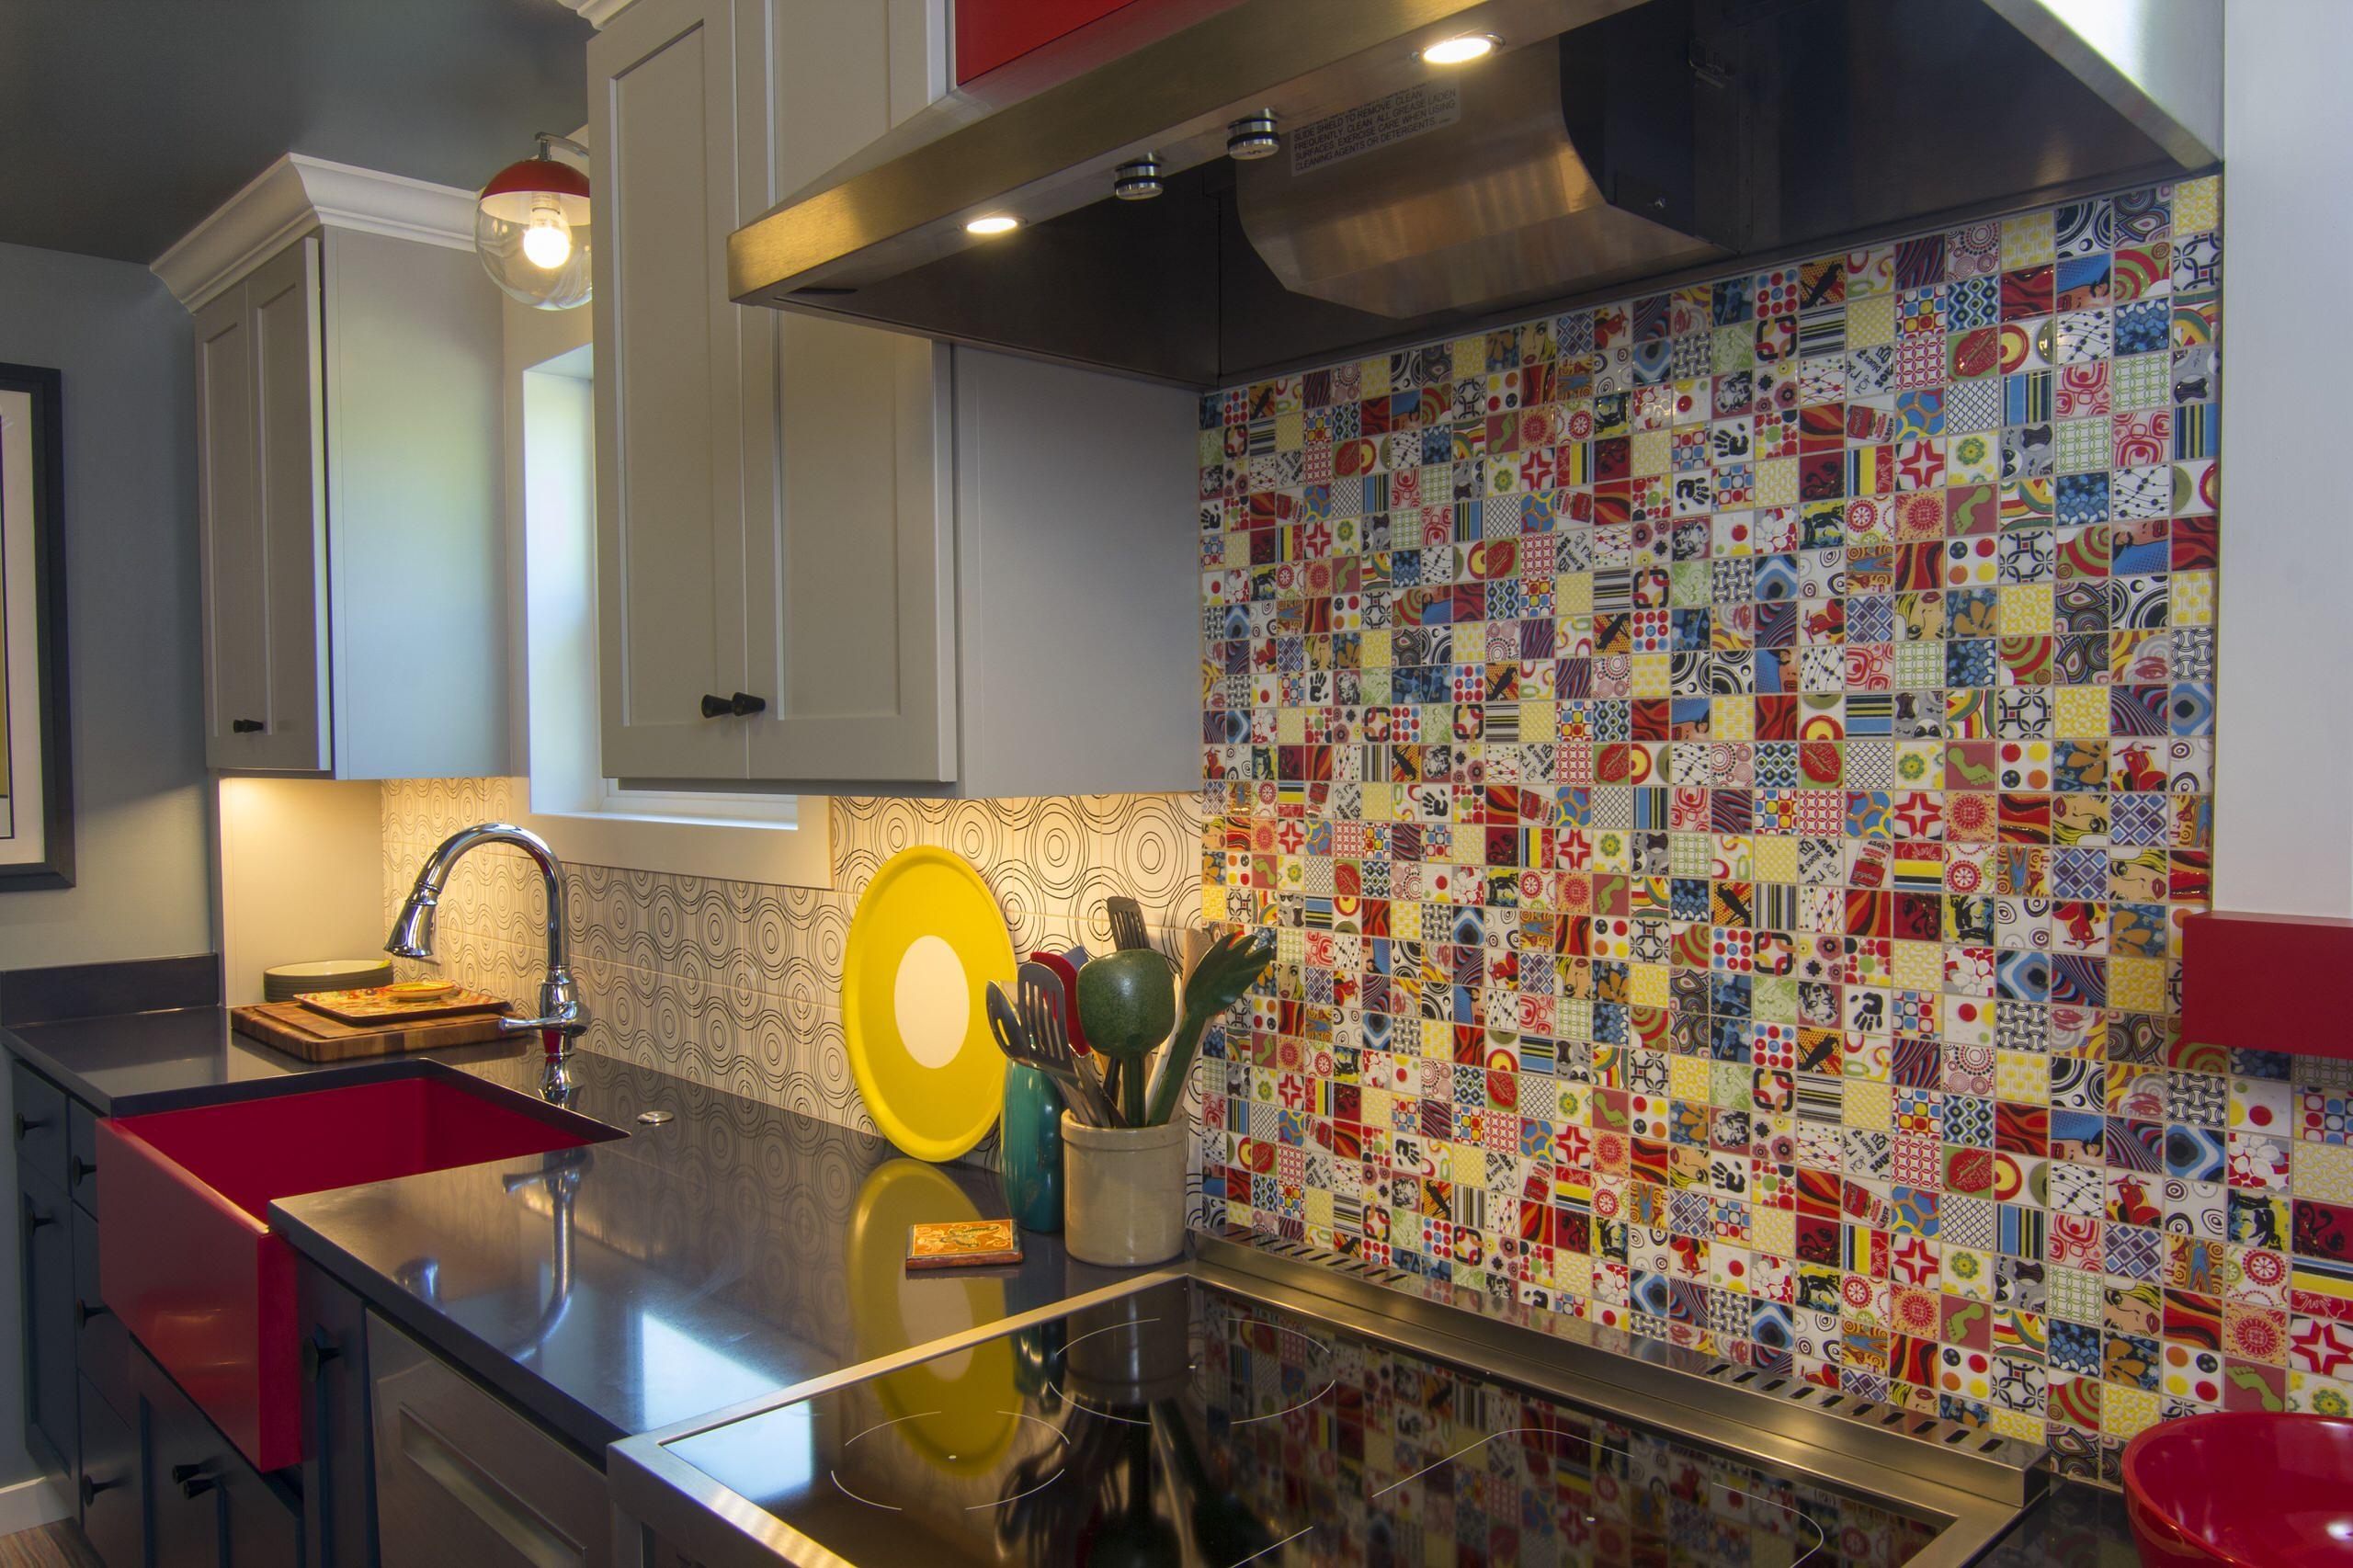 Seattle's Haller Lake Neighborhood - Retro 50's Kitchen - Home Birth Year 1948